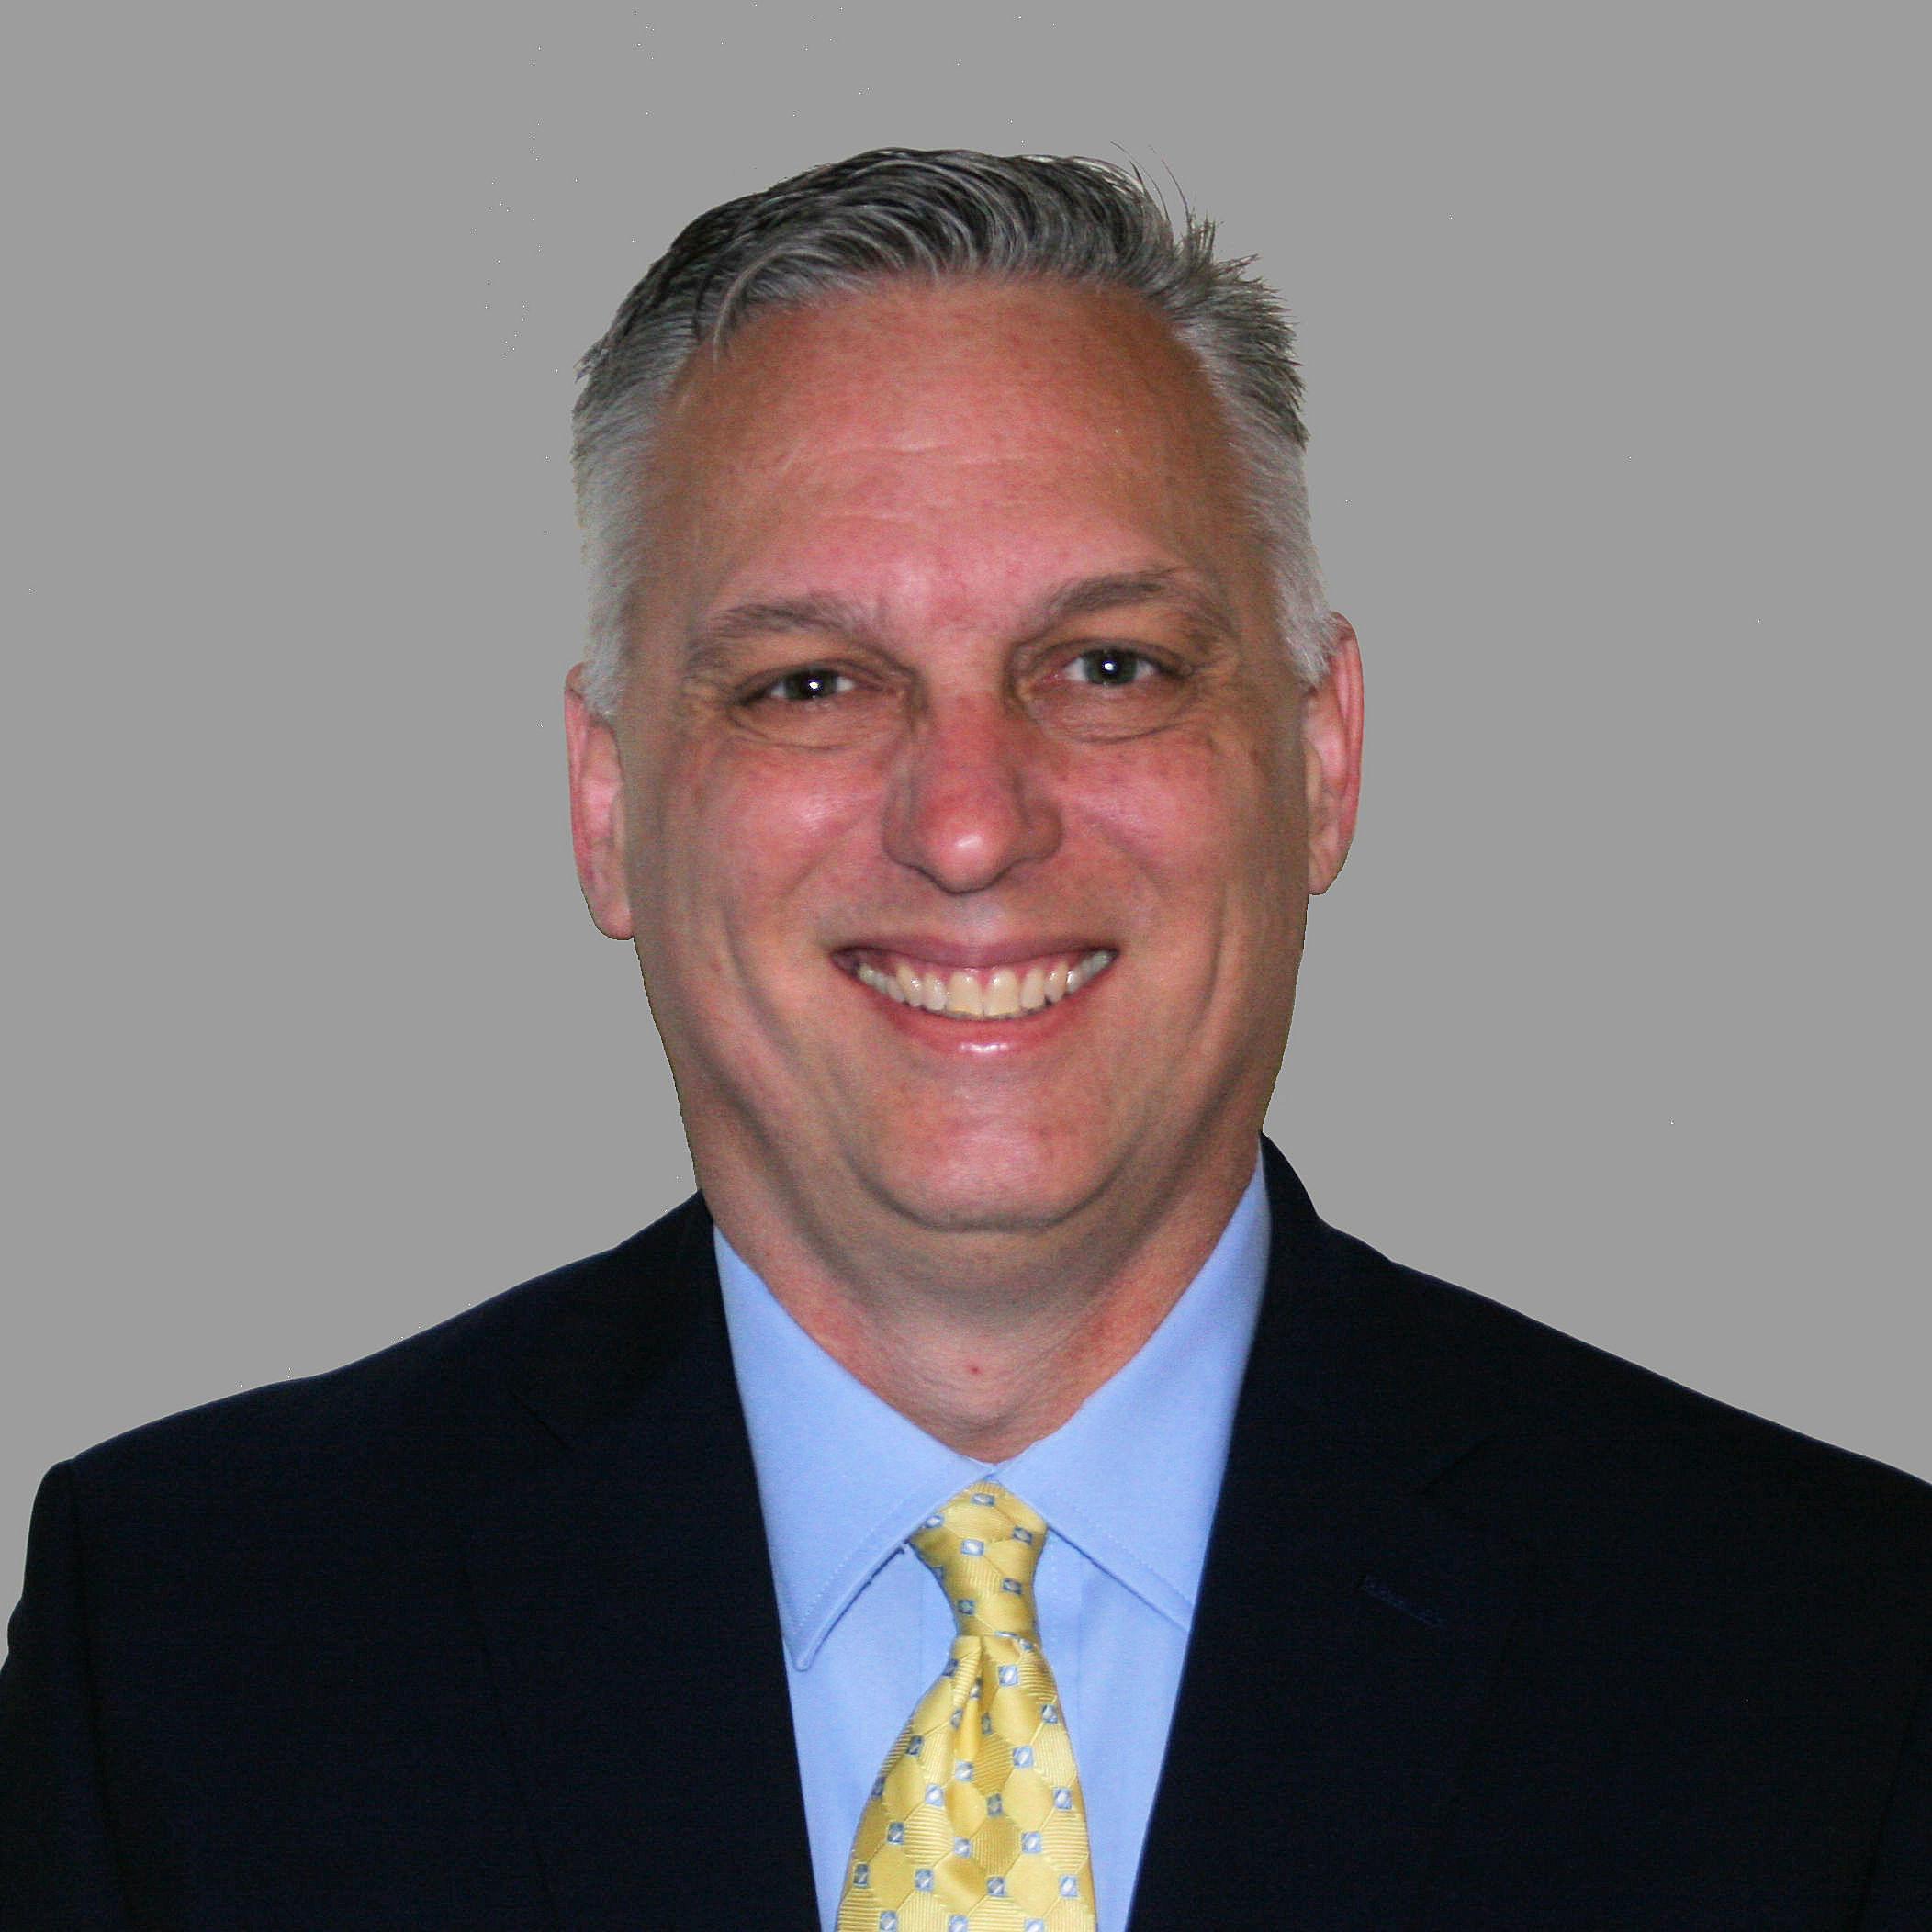 Gregg MacInnis